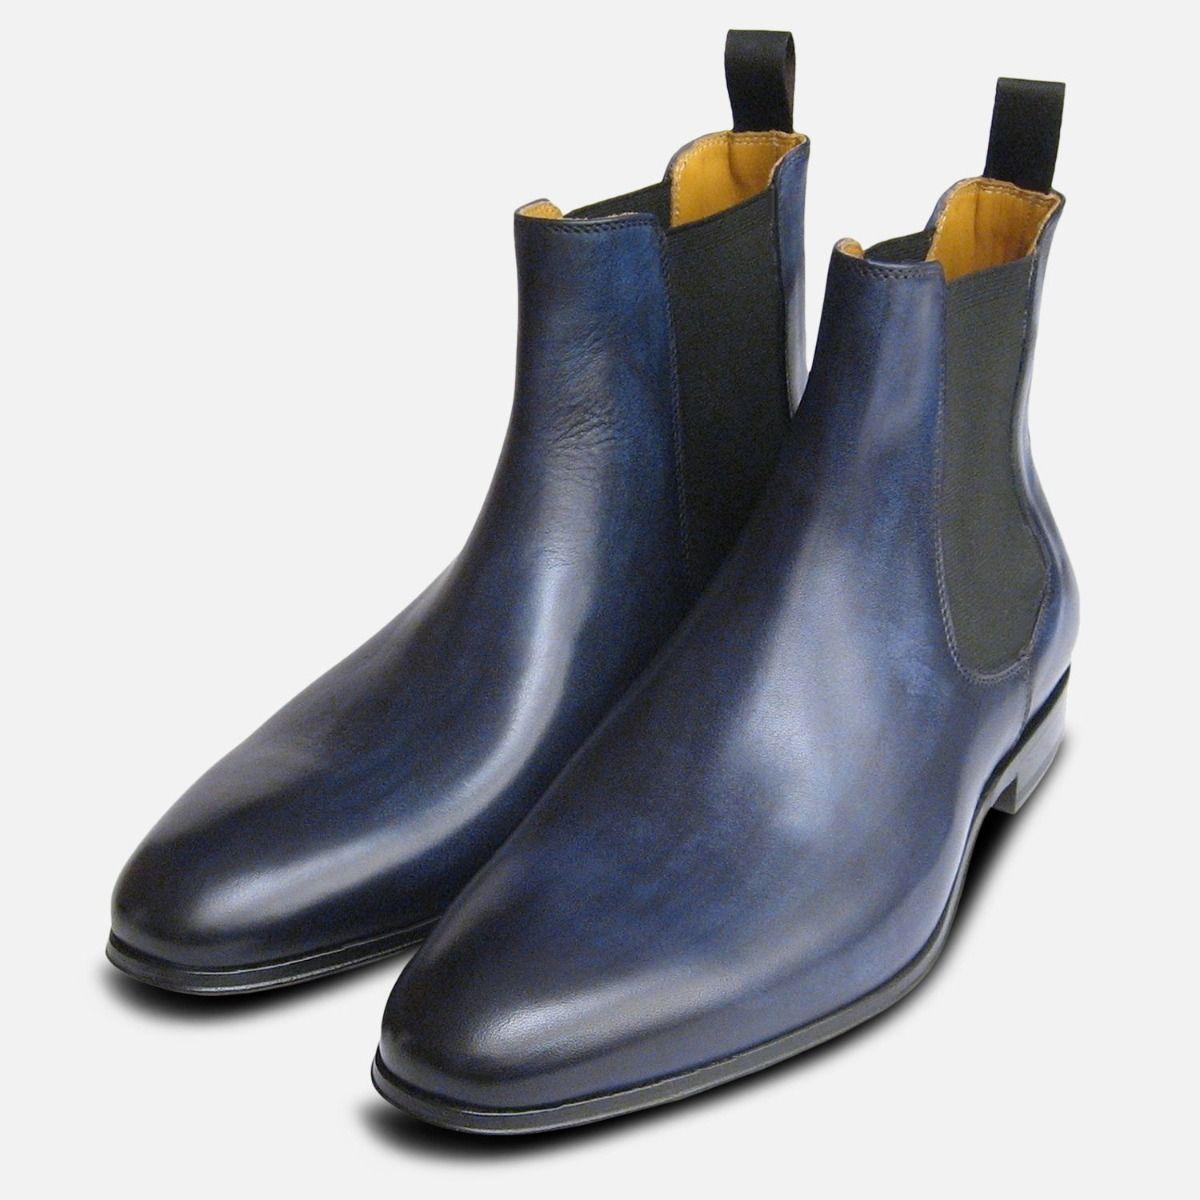 Antiqued Navy Blue Mens Chelsea Boots